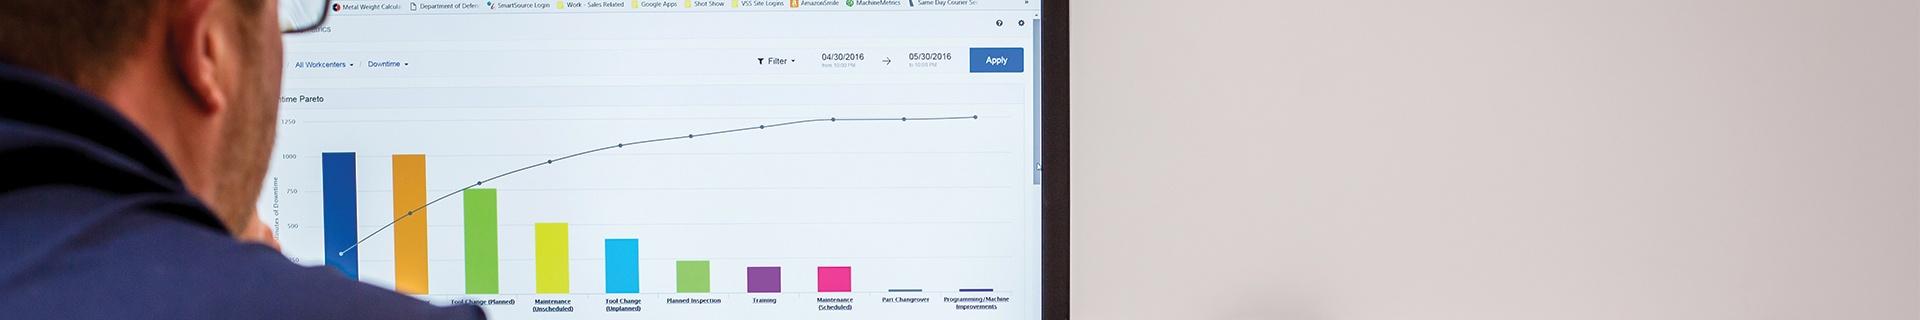 Machine Downtime Tracking & Reporting Software | MachineMetrics